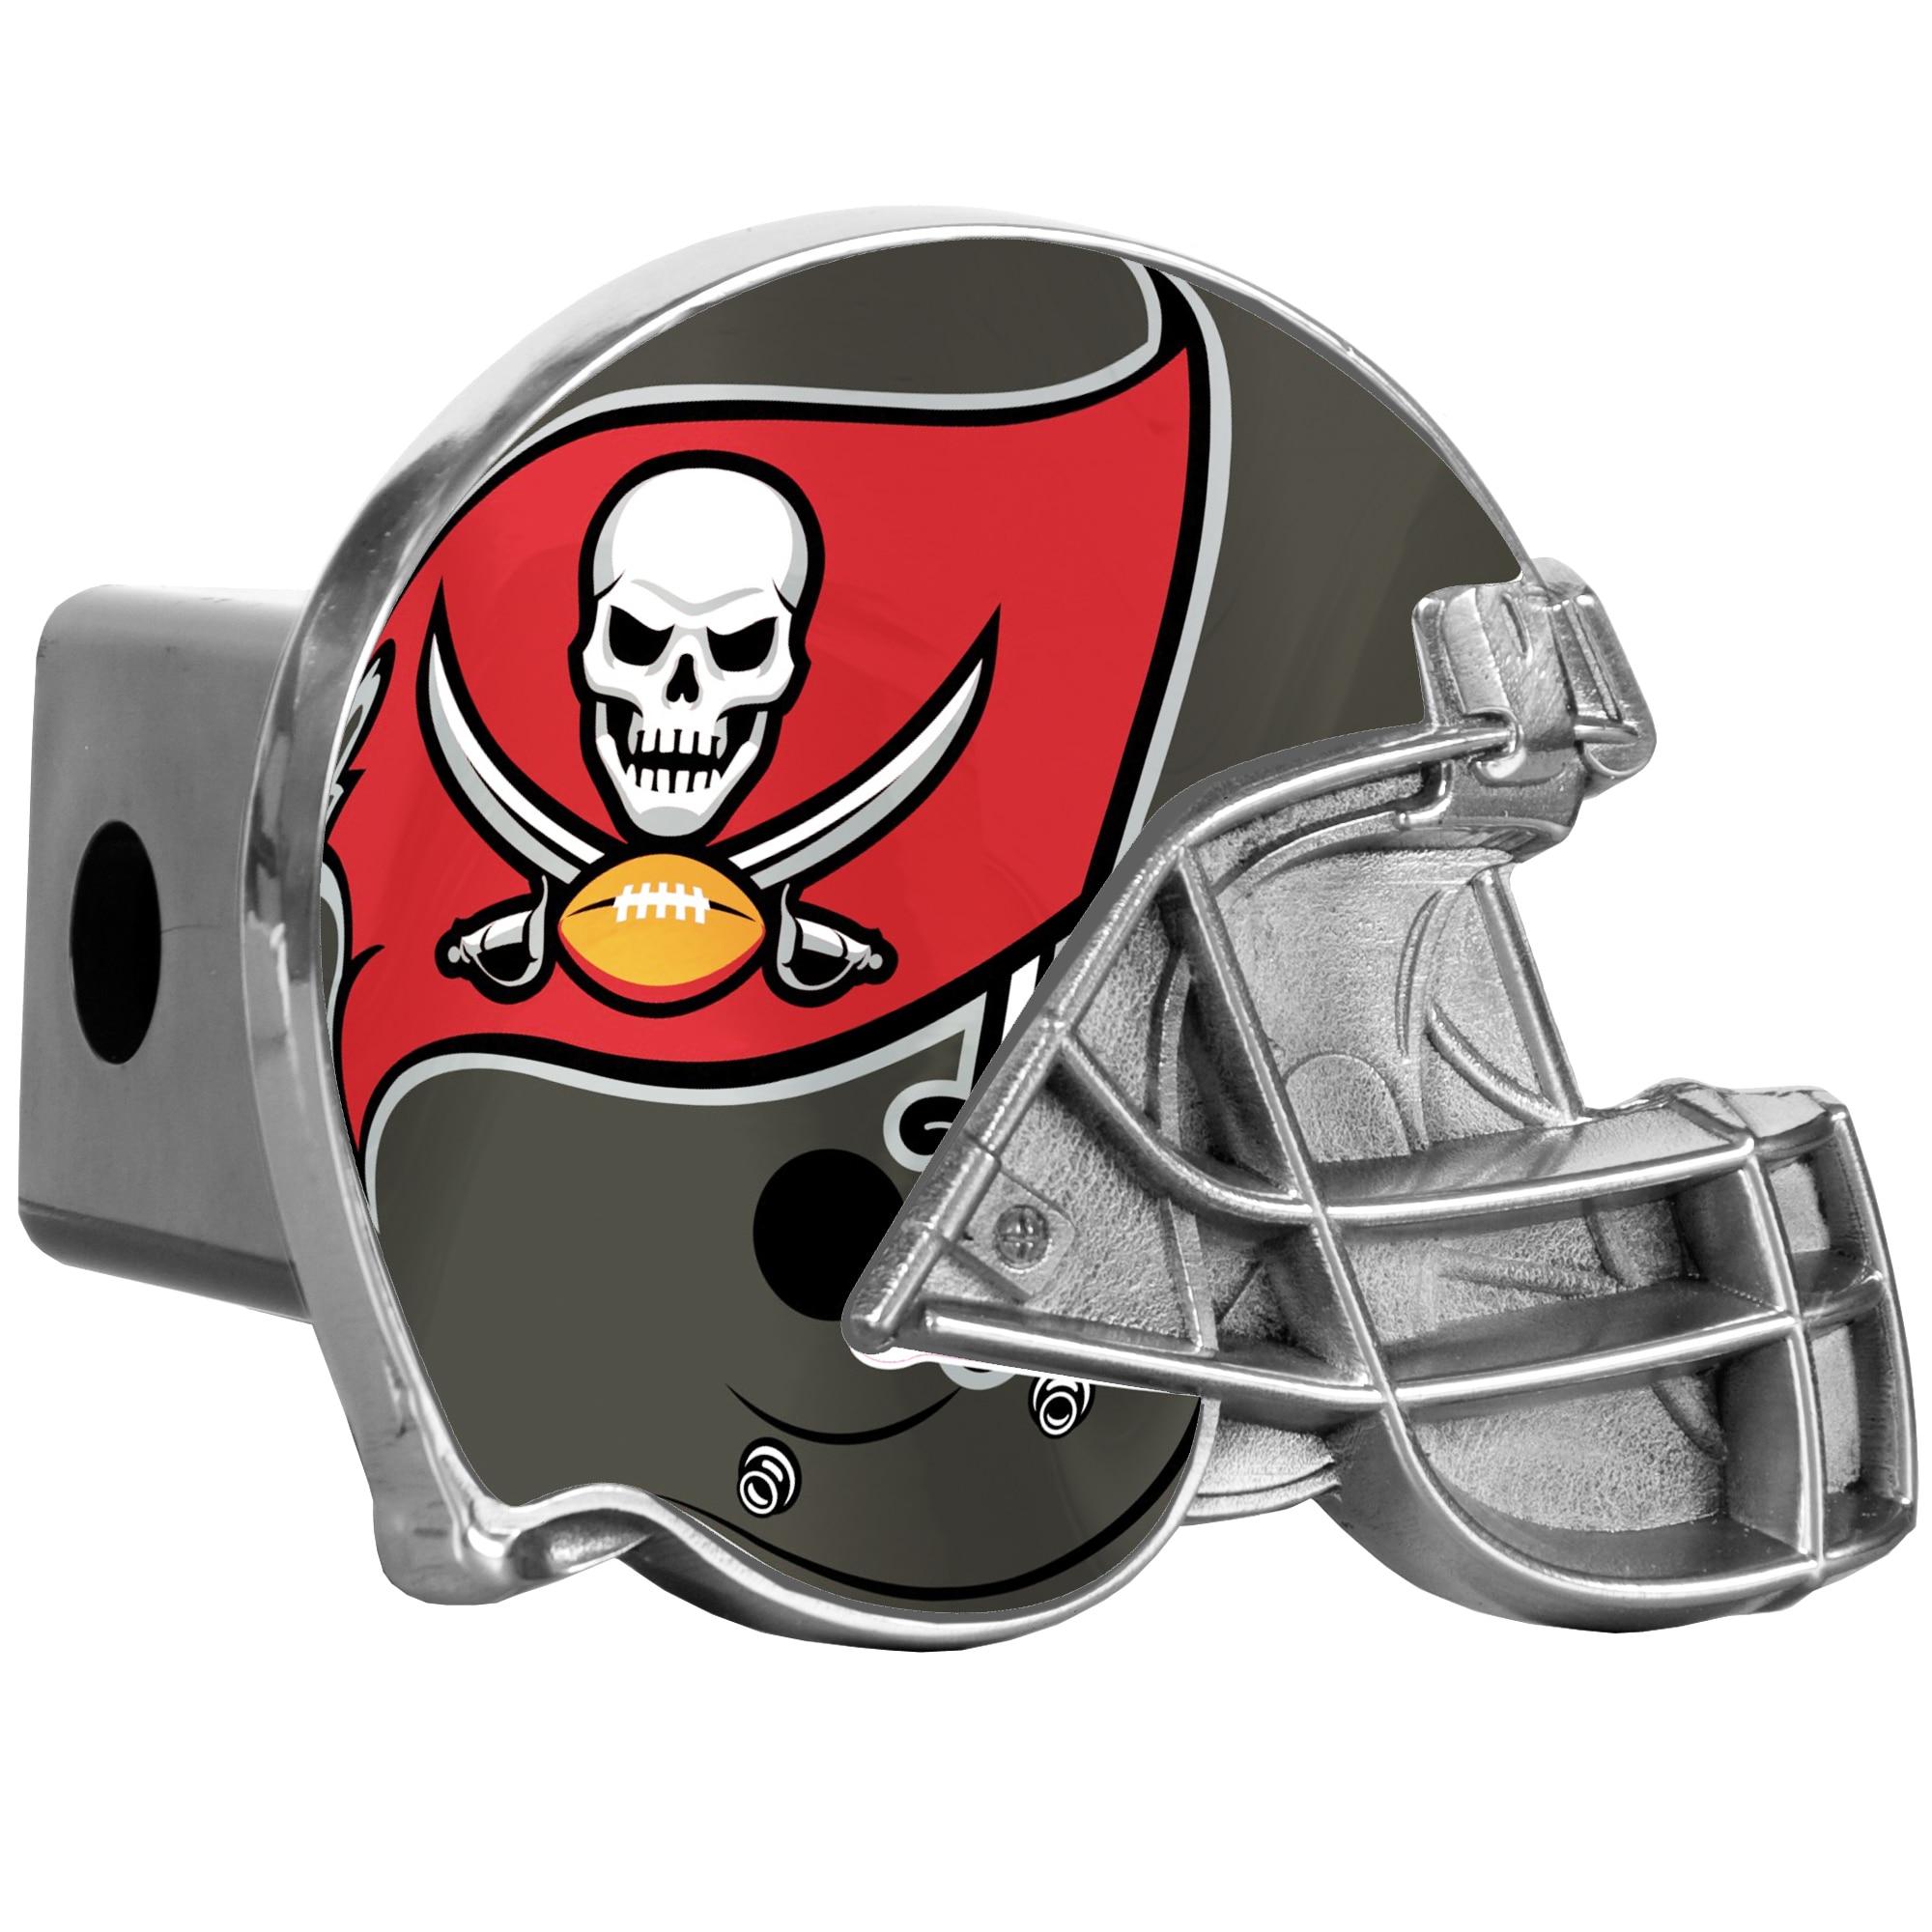 Tampa Bay Buccaneers Helmet Hitch Cover